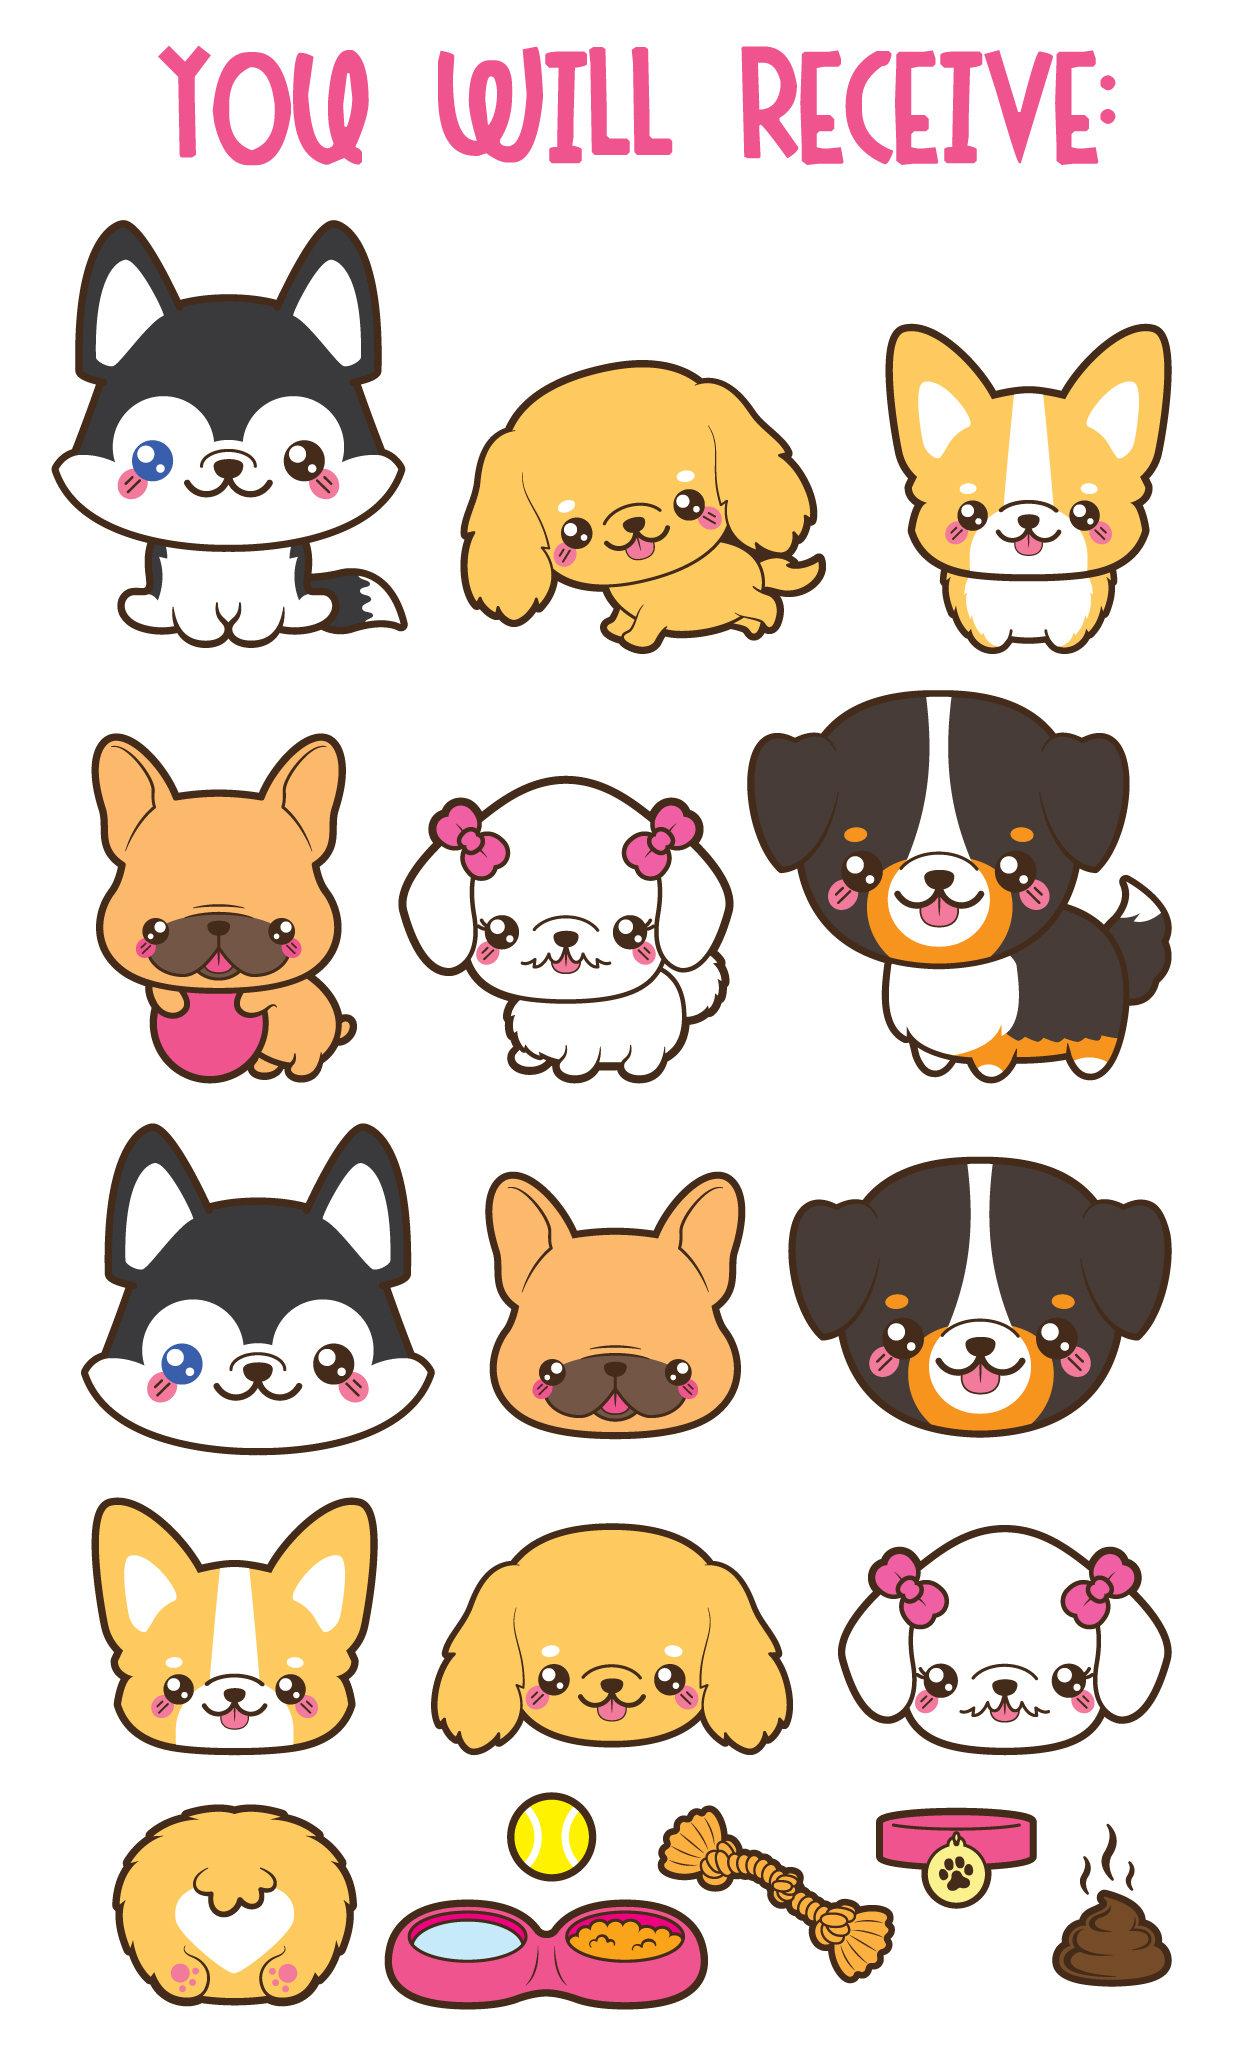 Chihuahua clipart kawaii. Dog cute breeds this